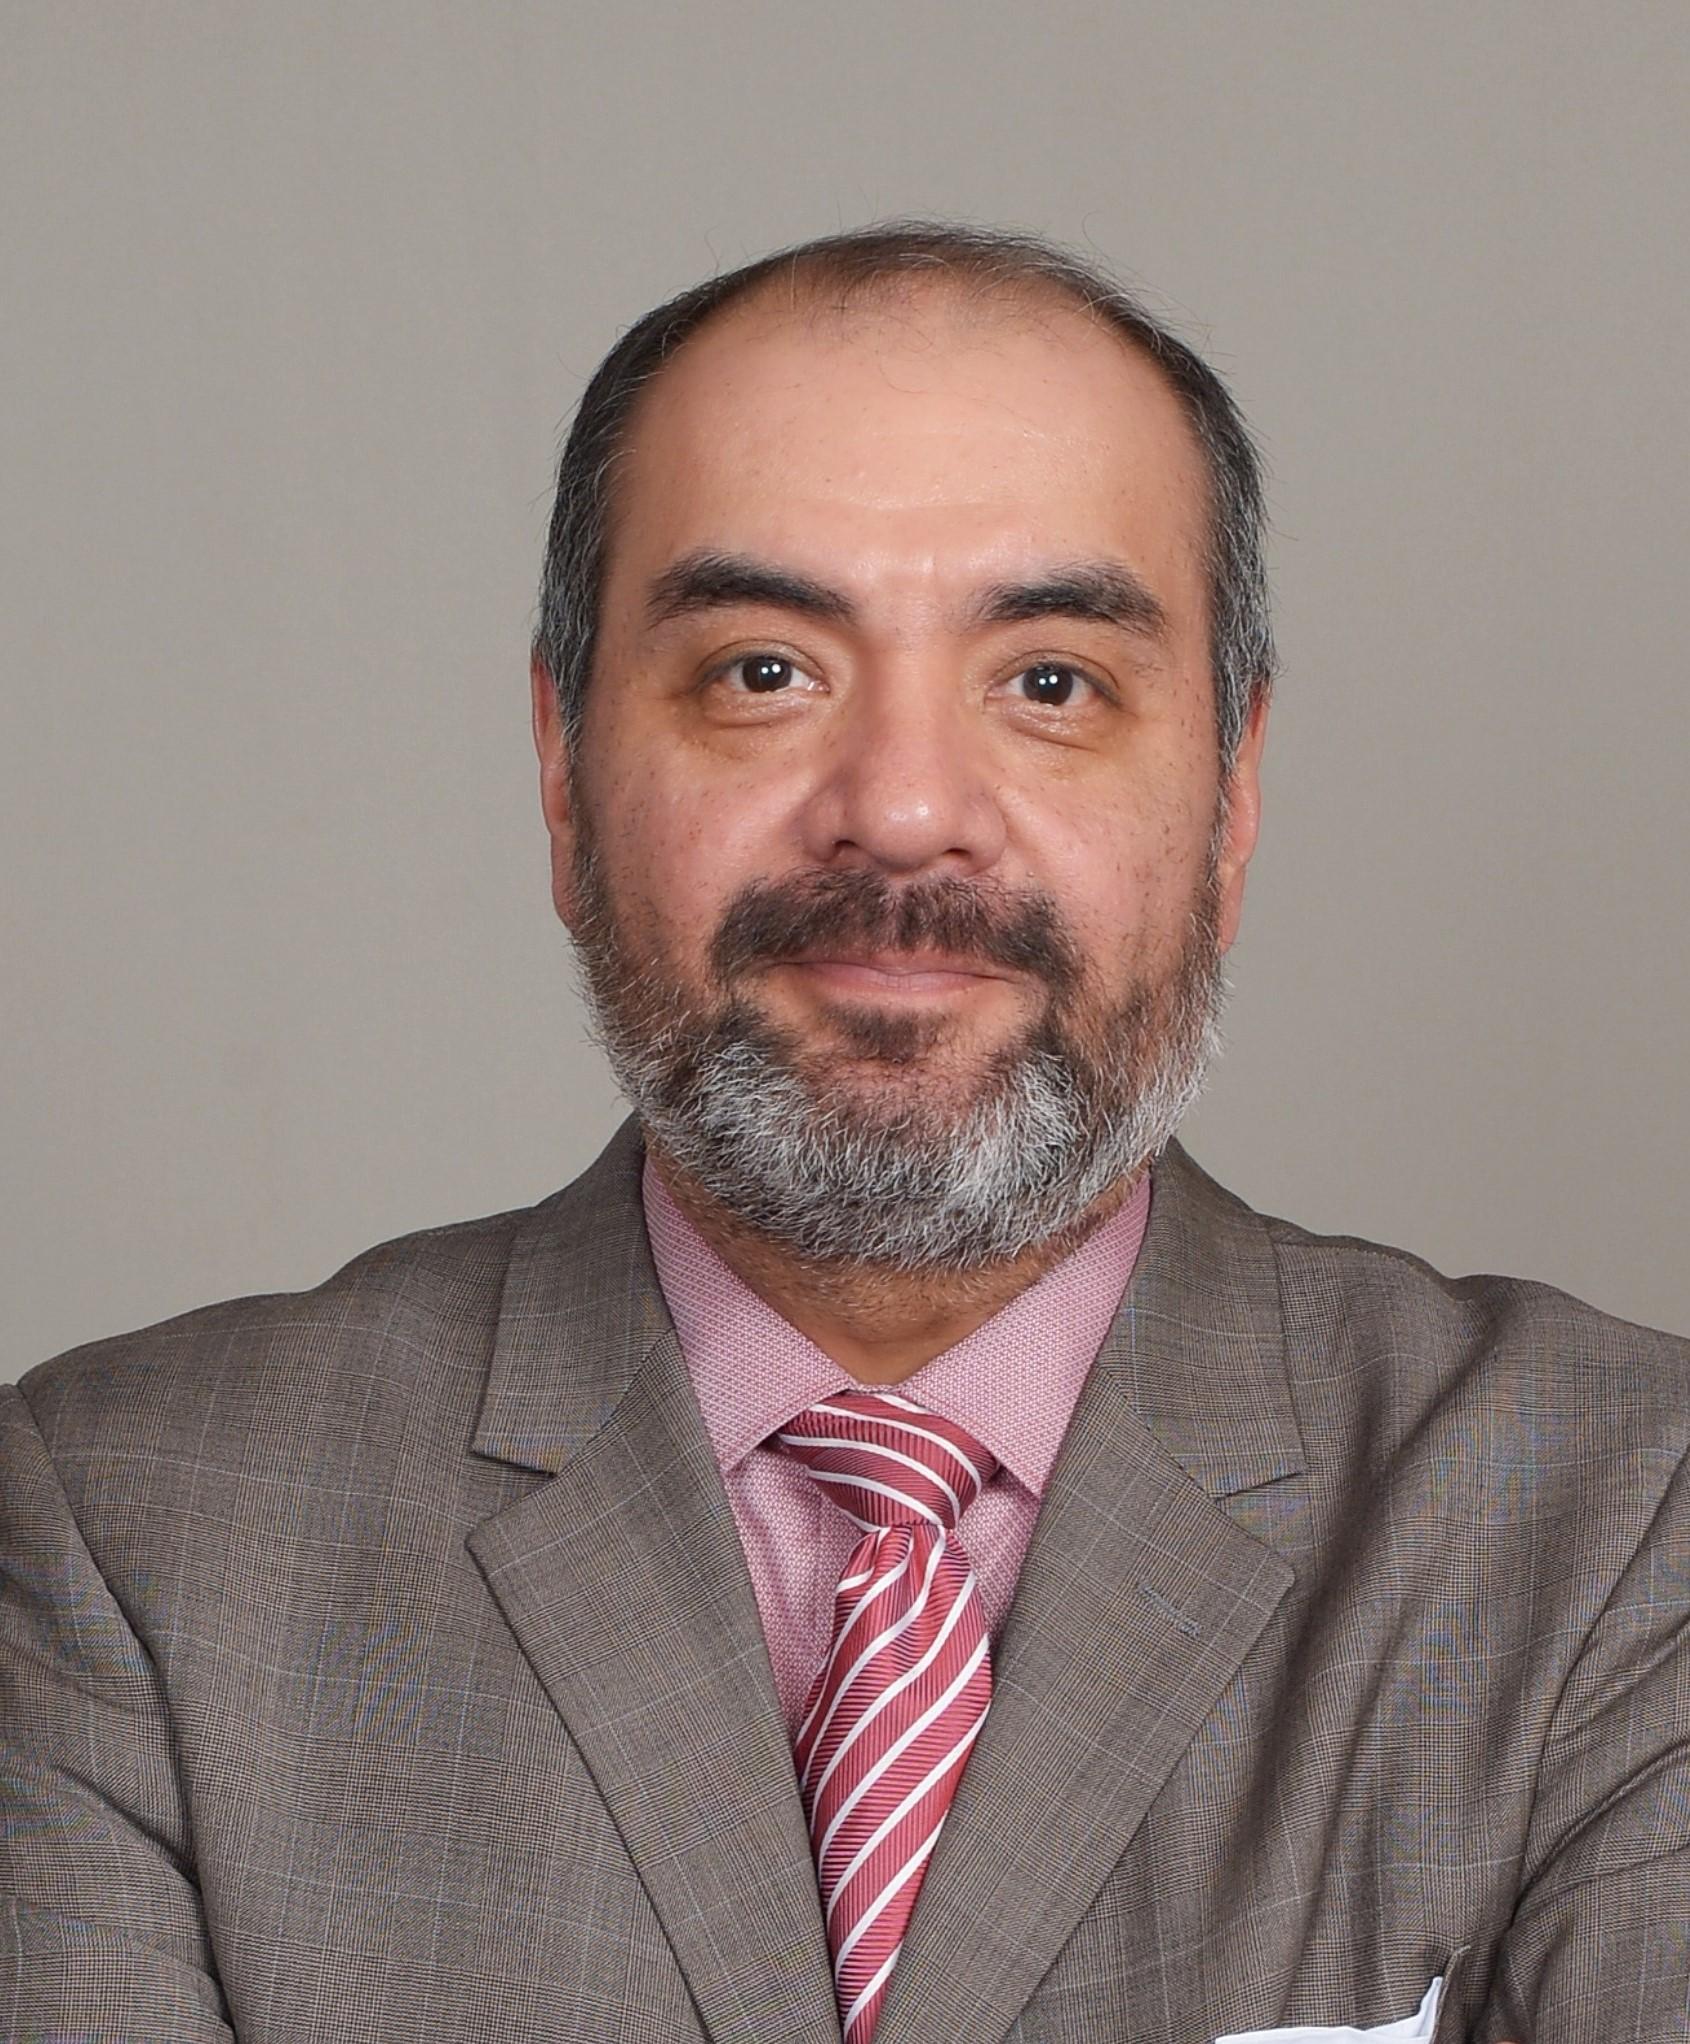 Jaime Vela - Farmers District Manager in El Paso, TX